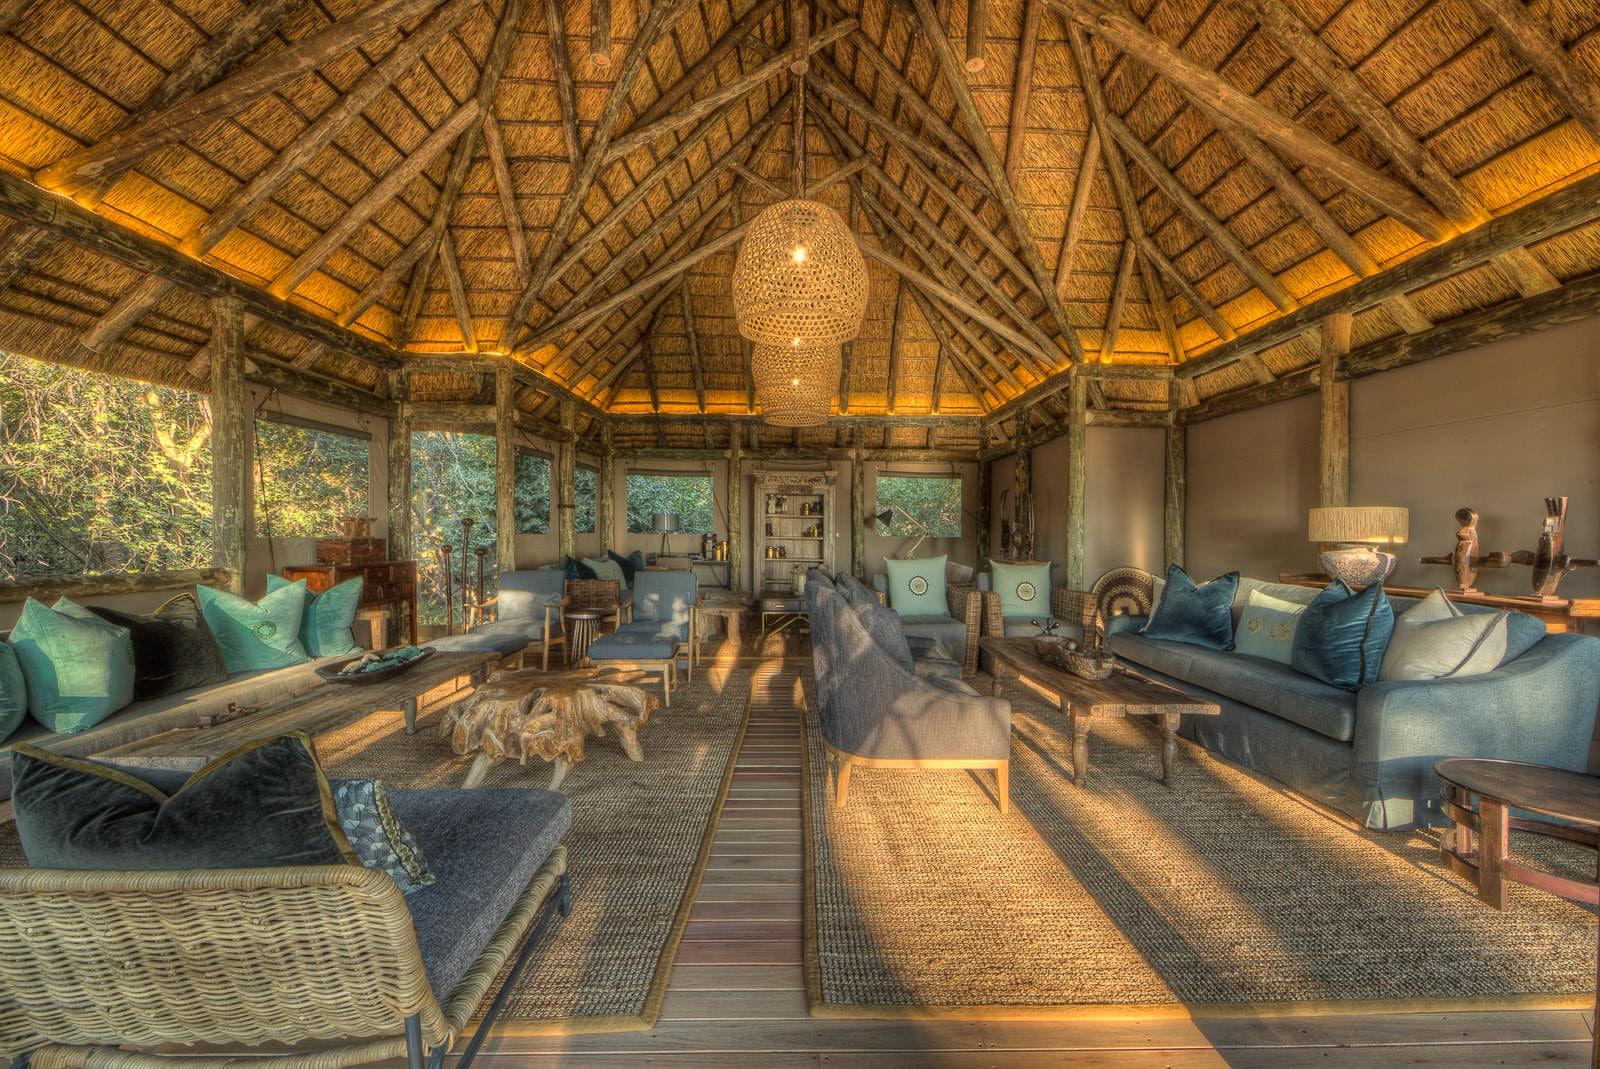 Camp-Moremi-Okavango-Delta-Botswana-10